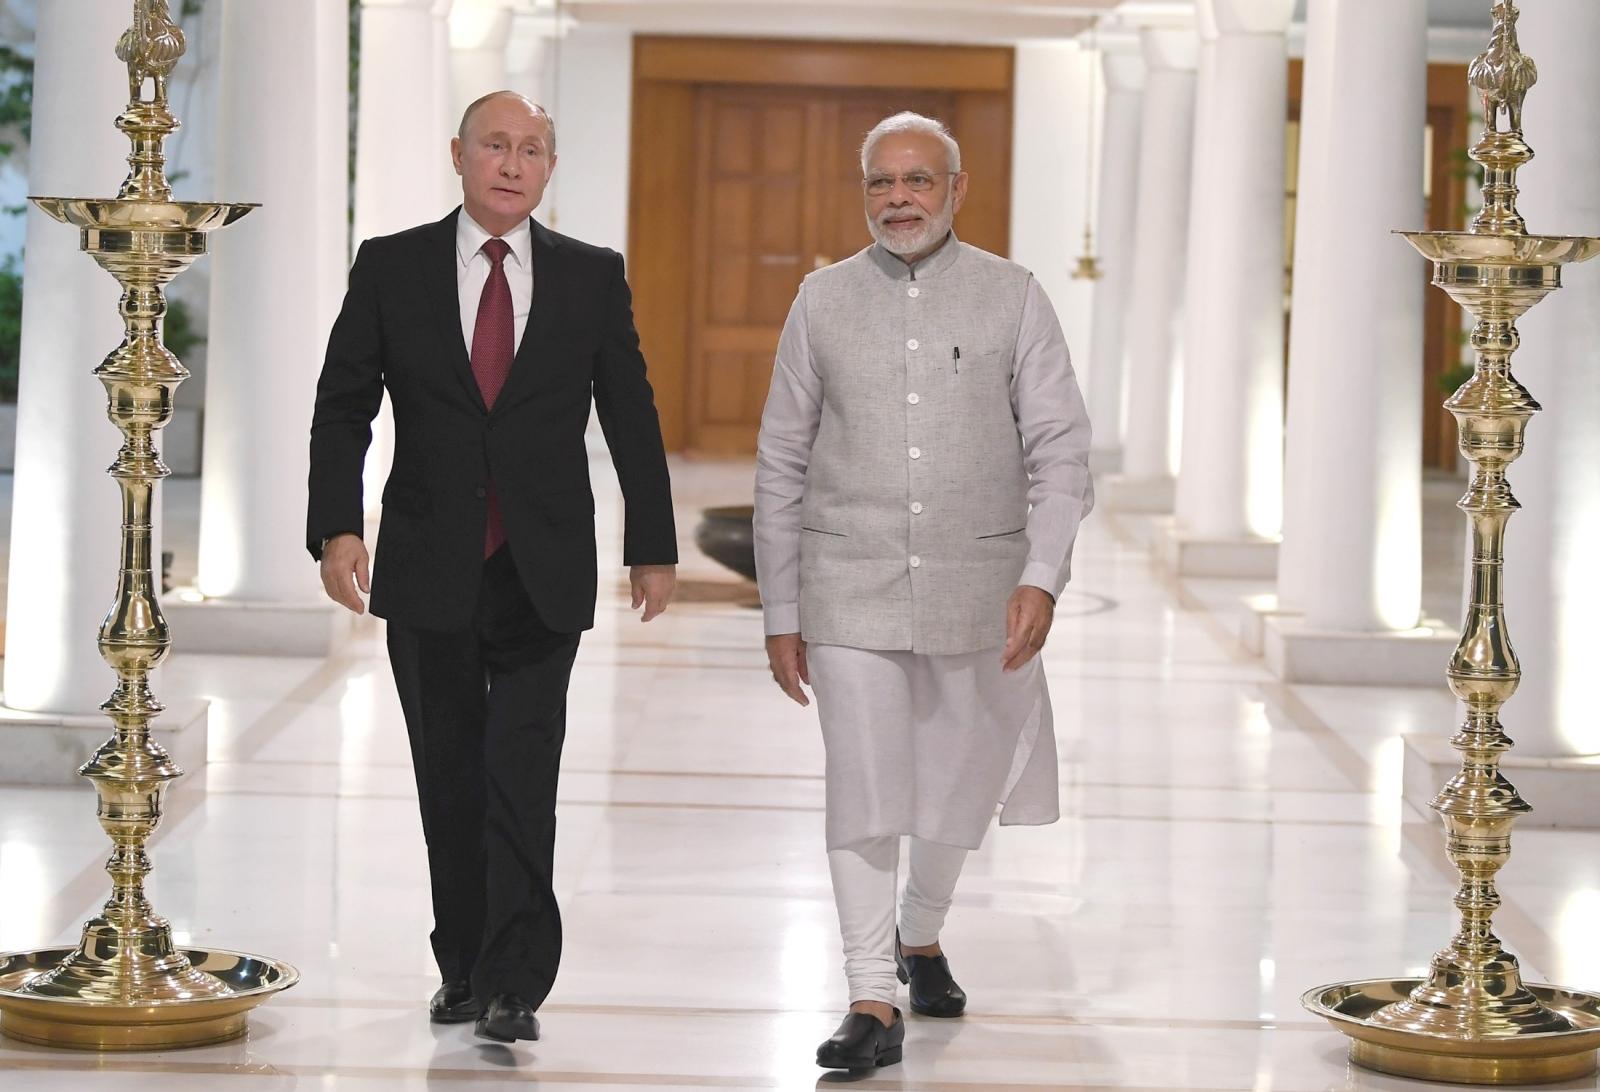 Predsednika Putin in Modi Vir:Pixell